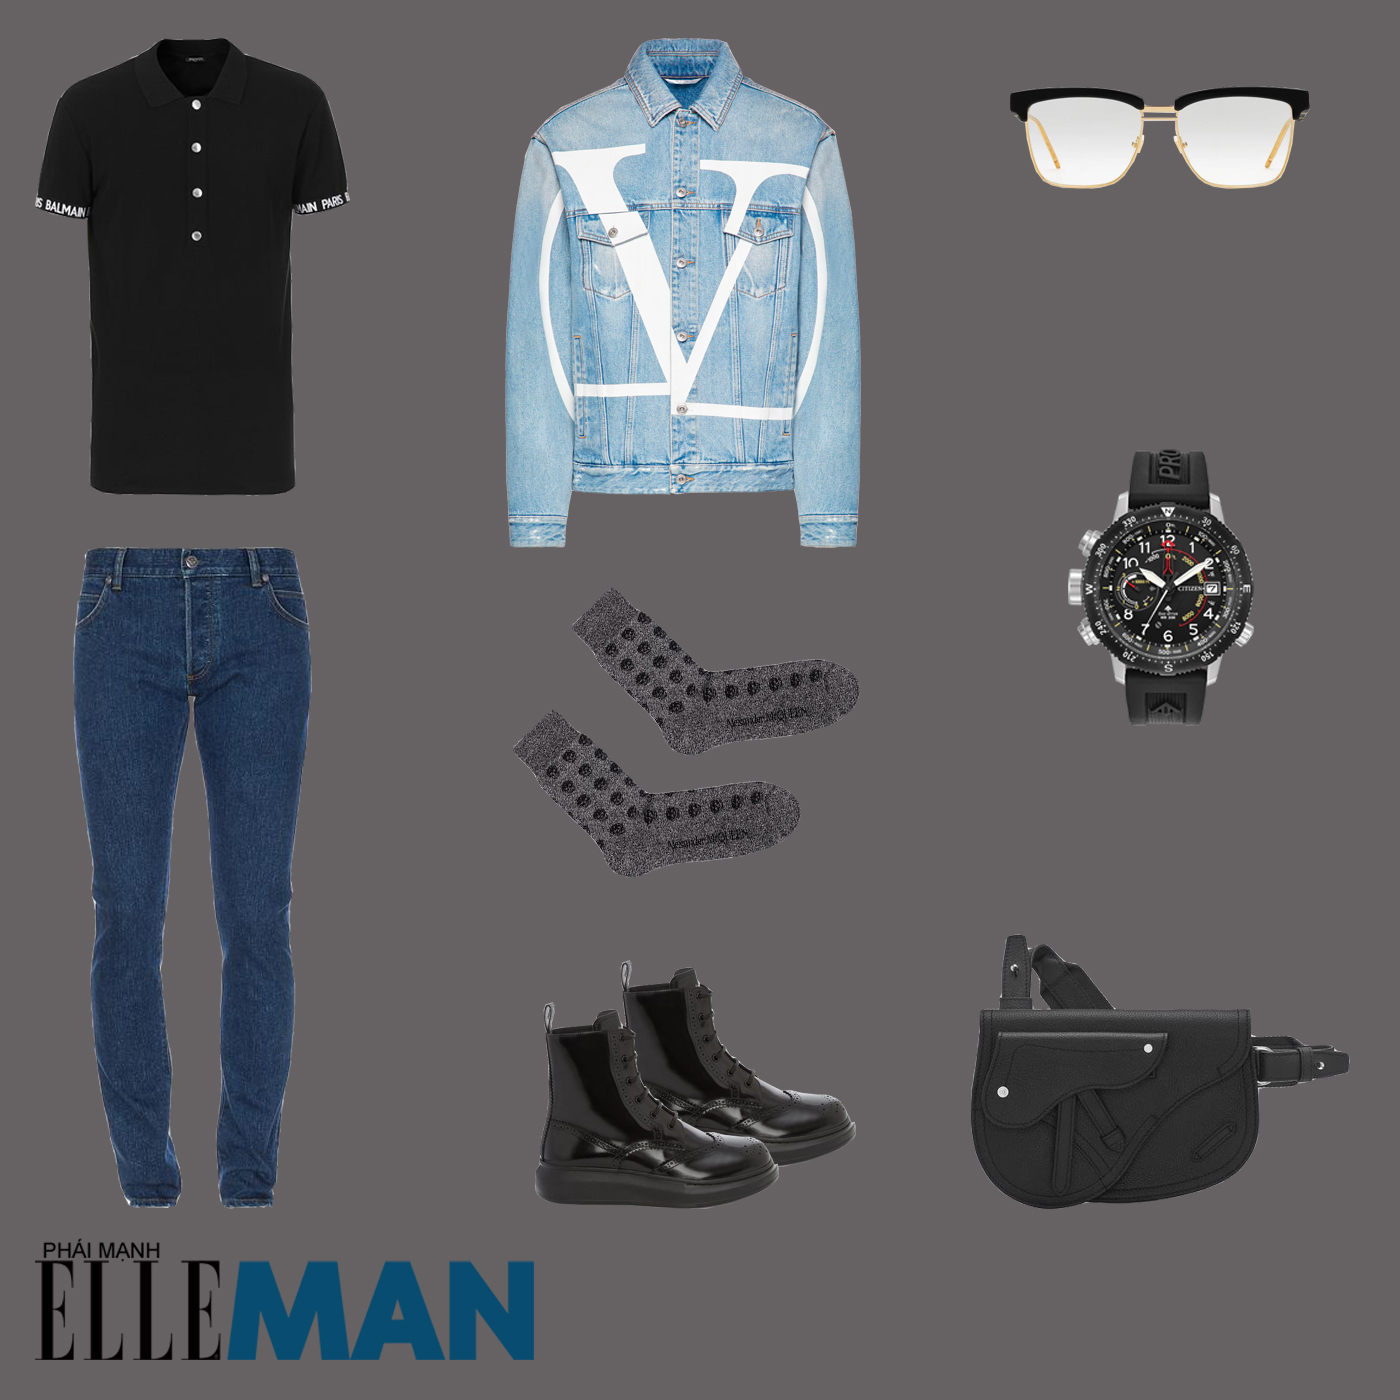 outfit 3 - phối đồ phong cách smart-casual